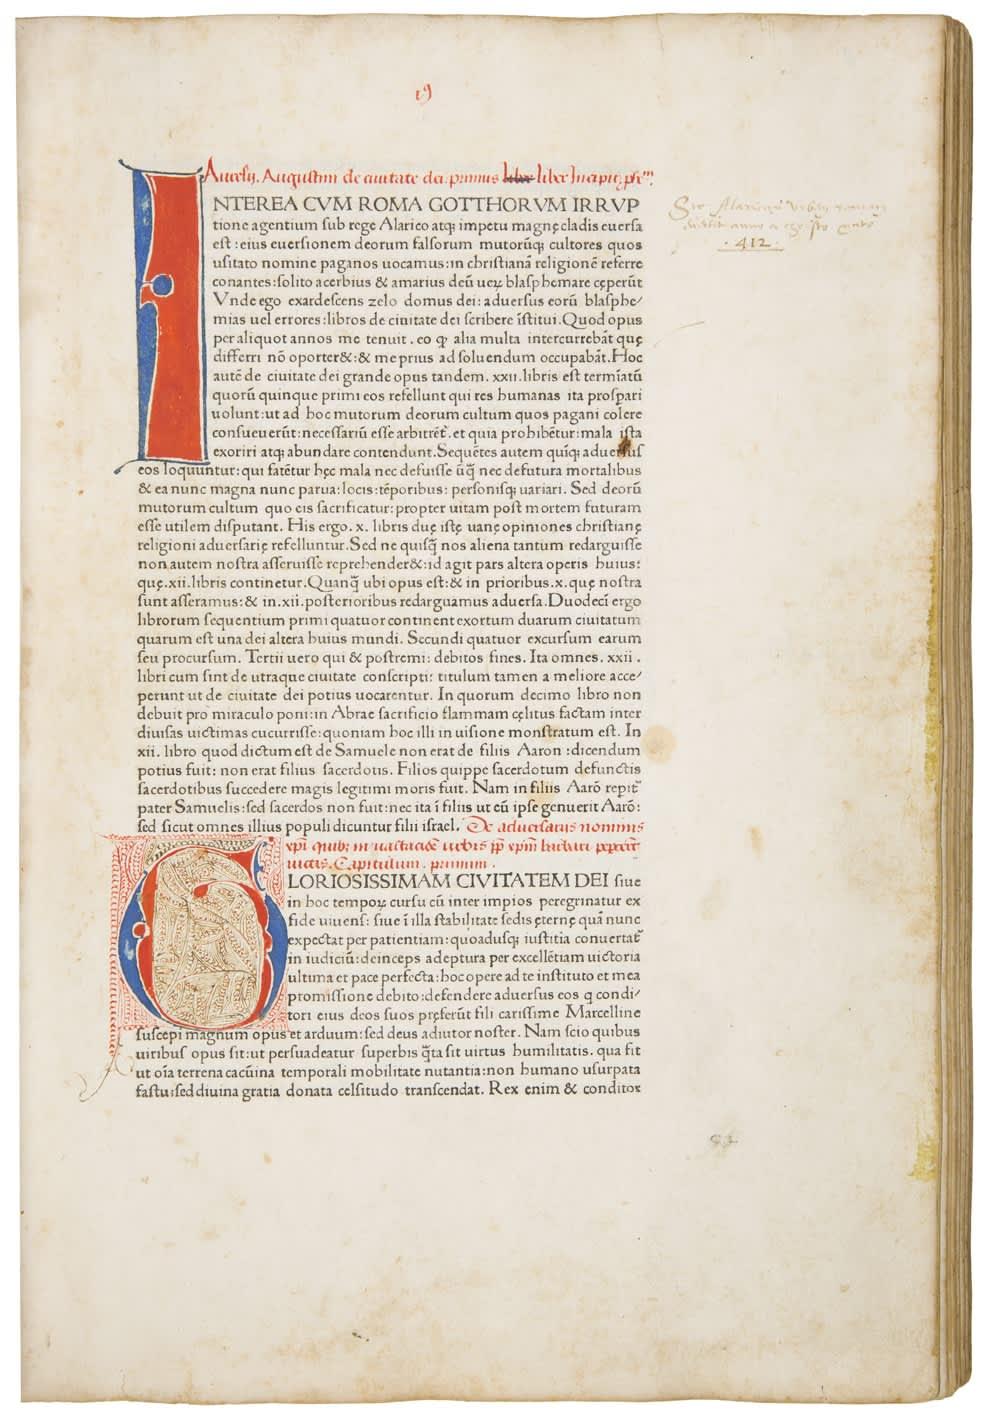 Aurelius Augustinus, De civitate dei. Venice: Johannes and Vindelinus de Spira, 1470. Third or fourth edition of Augustine's most important work, the first printed in Venice.